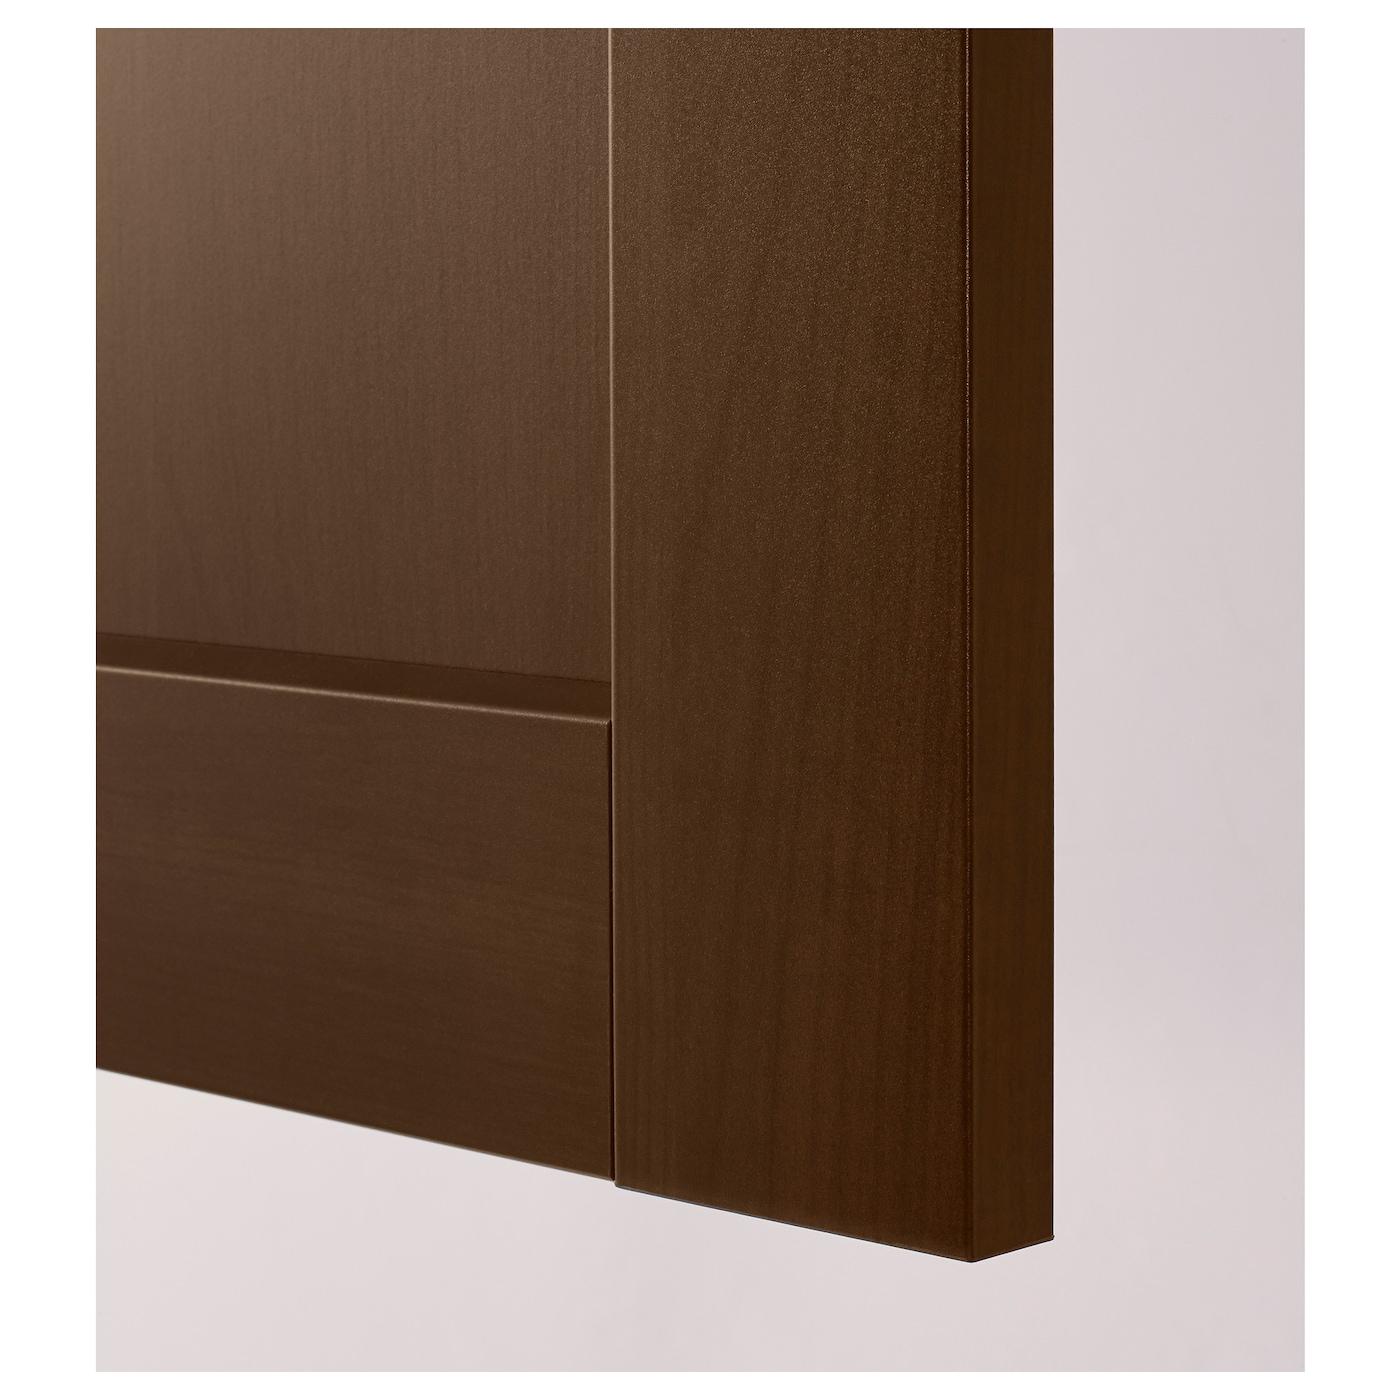 edserum drawer front wood effect brown 60x40 cm ikea. Black Bedroom Furniture Sets. Home Design Ideas